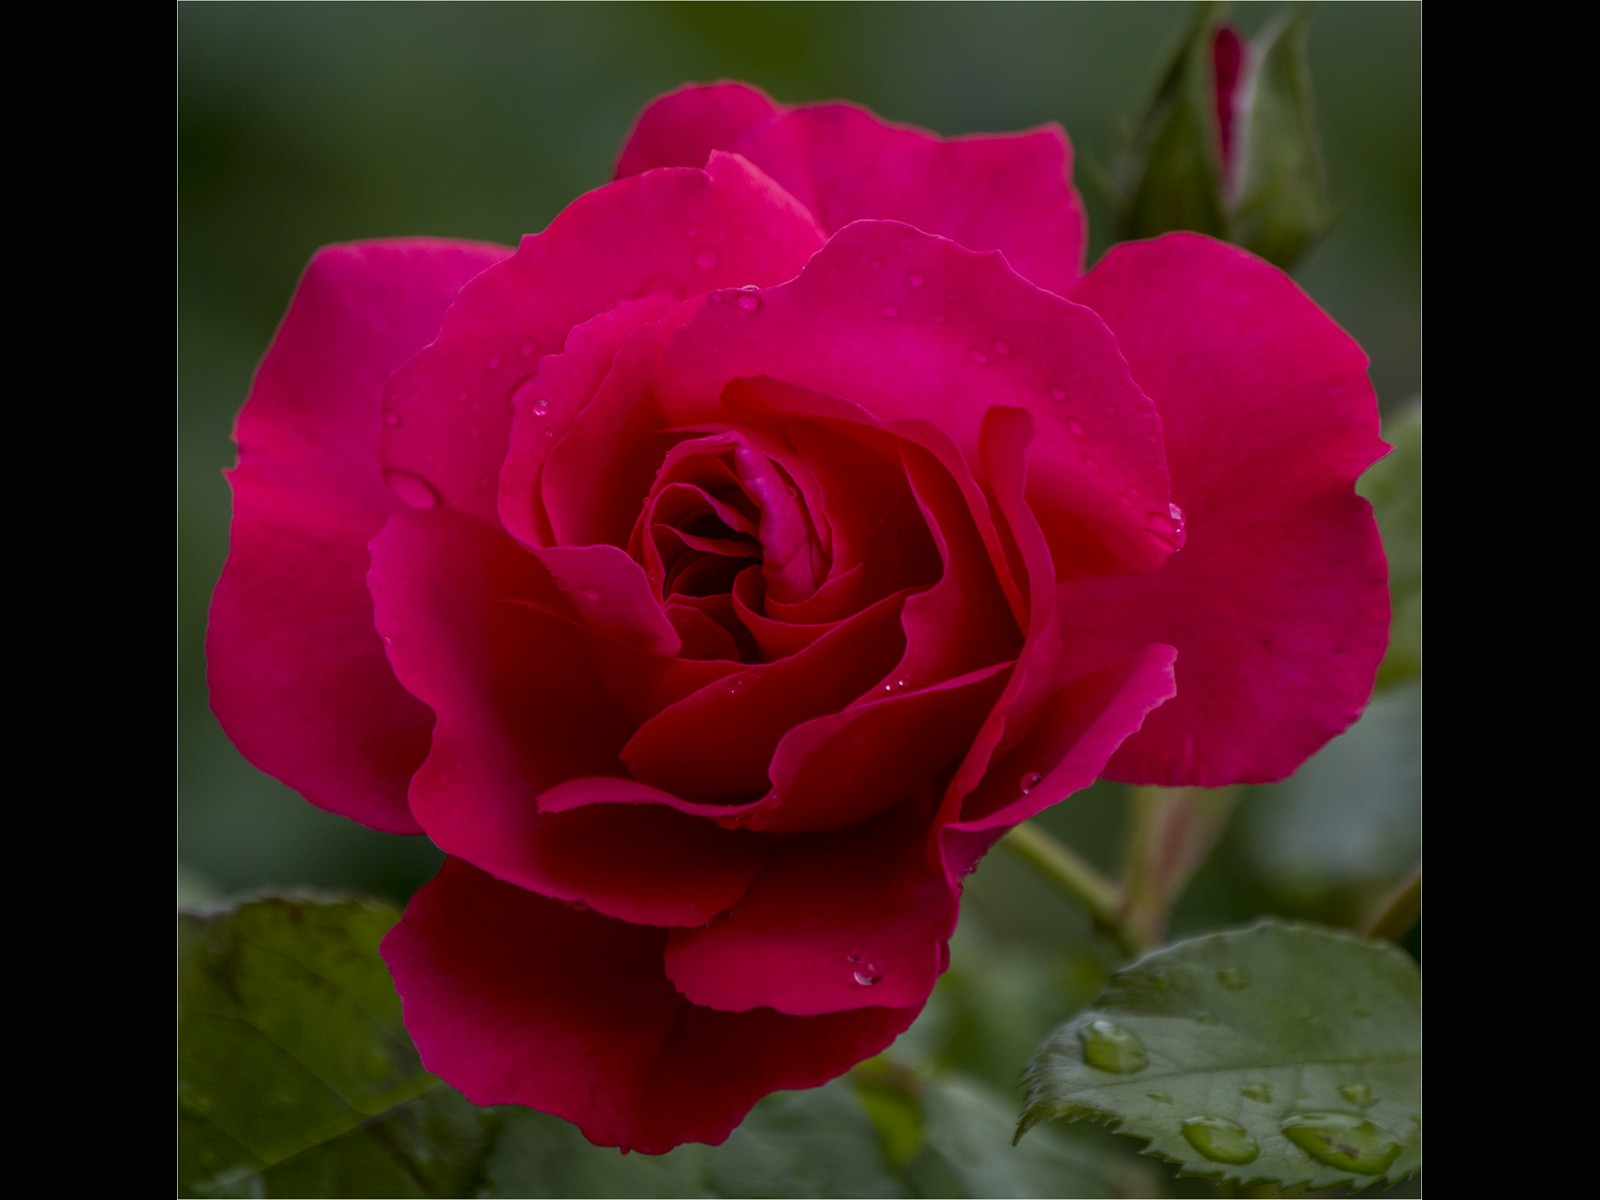 My cherished garden rose